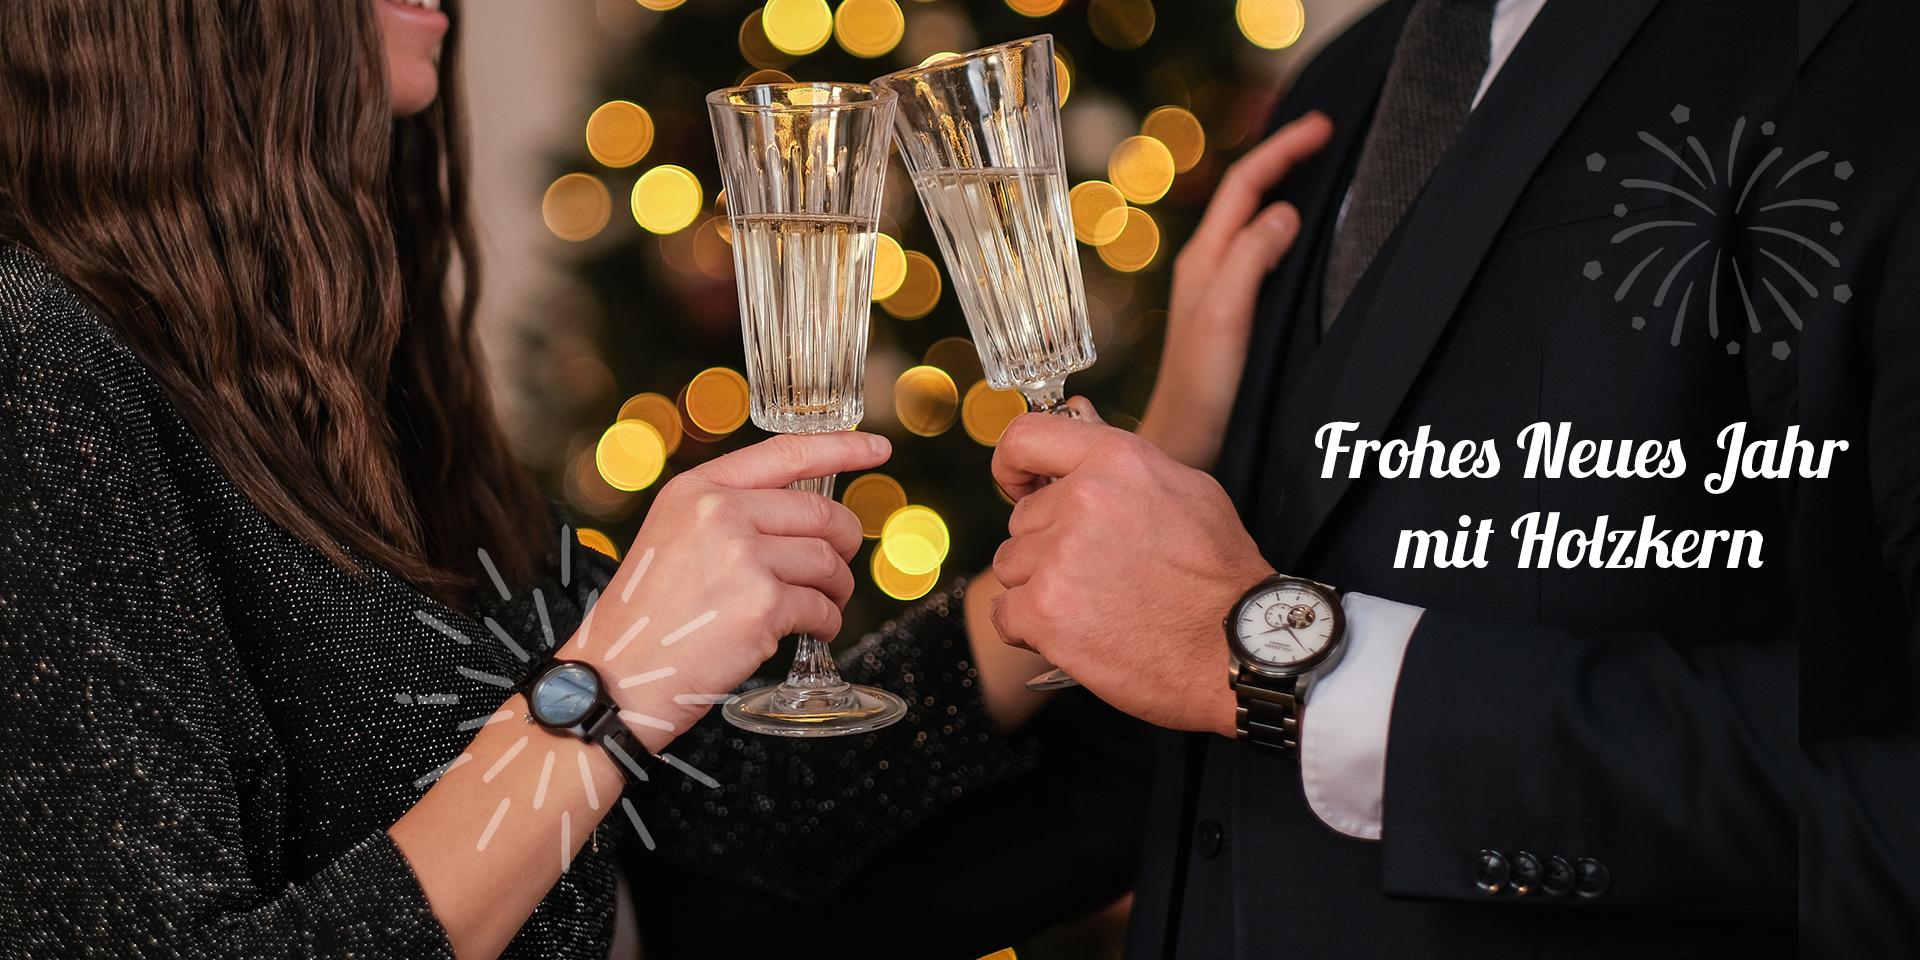 Happy New Year (tittle bild)